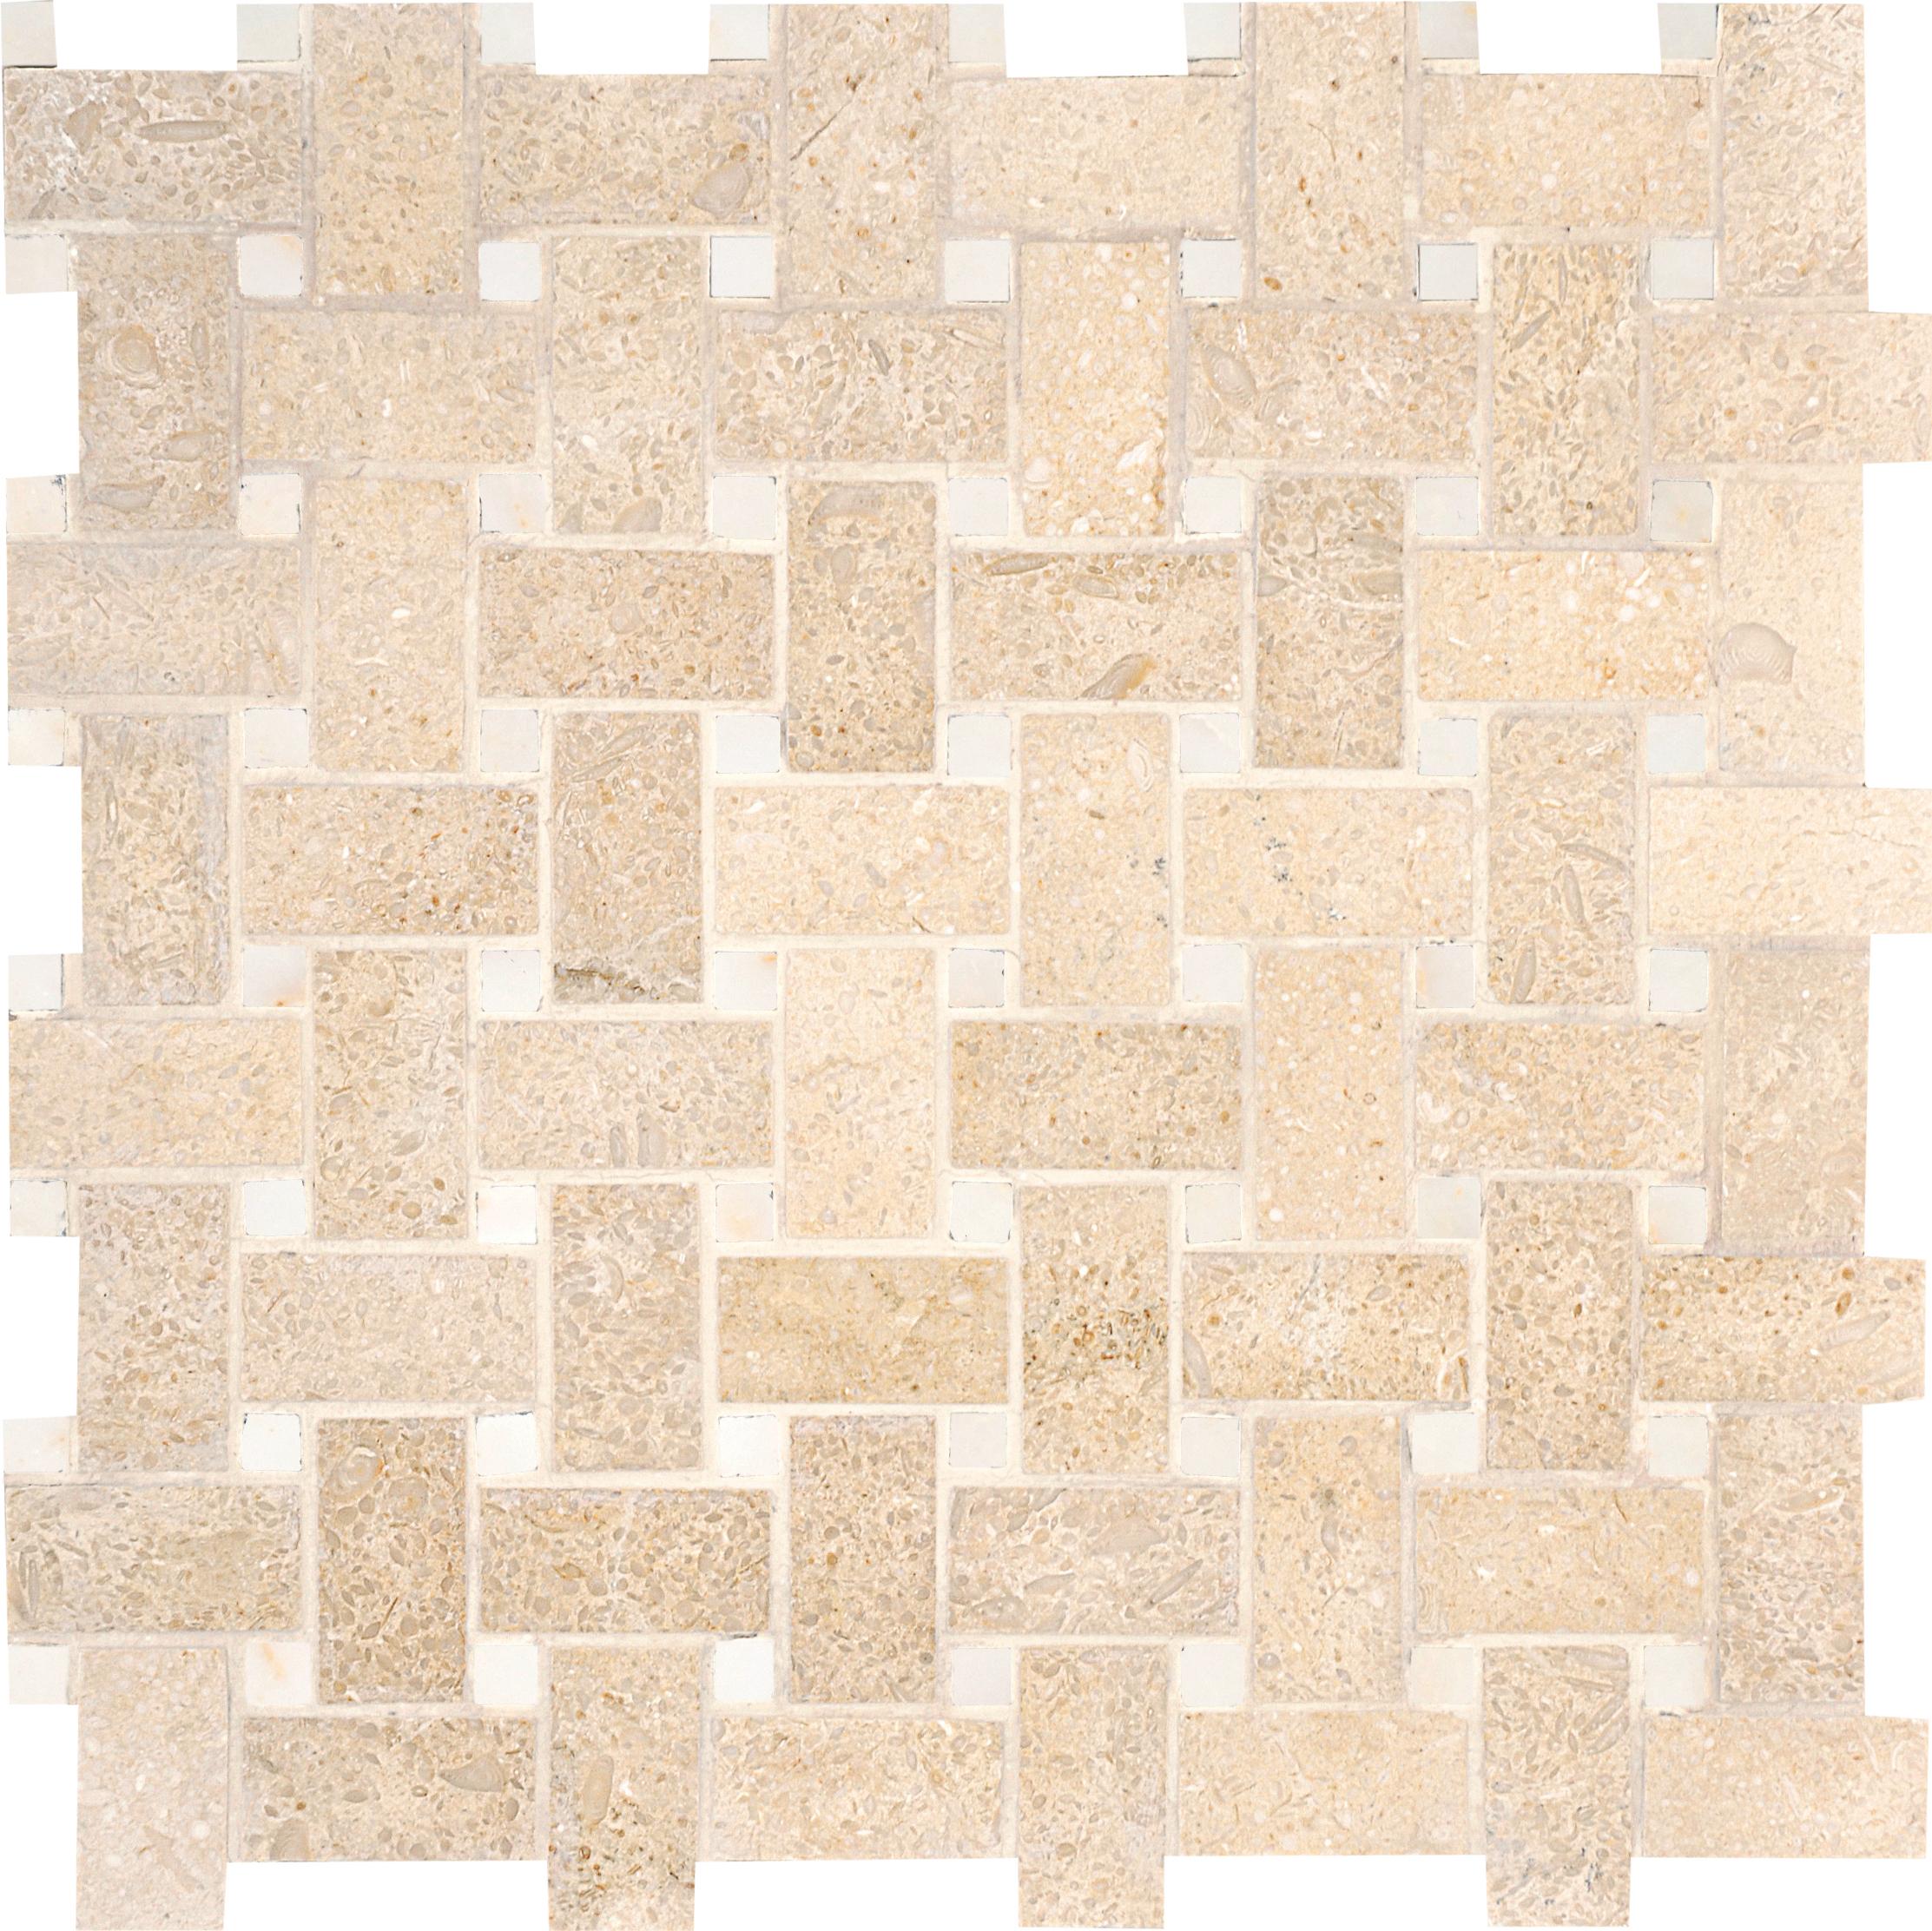 "MS00709 seashell & afyon sugar honed basket weave 1""x2"" 12""x12""x3/8"" sheets"